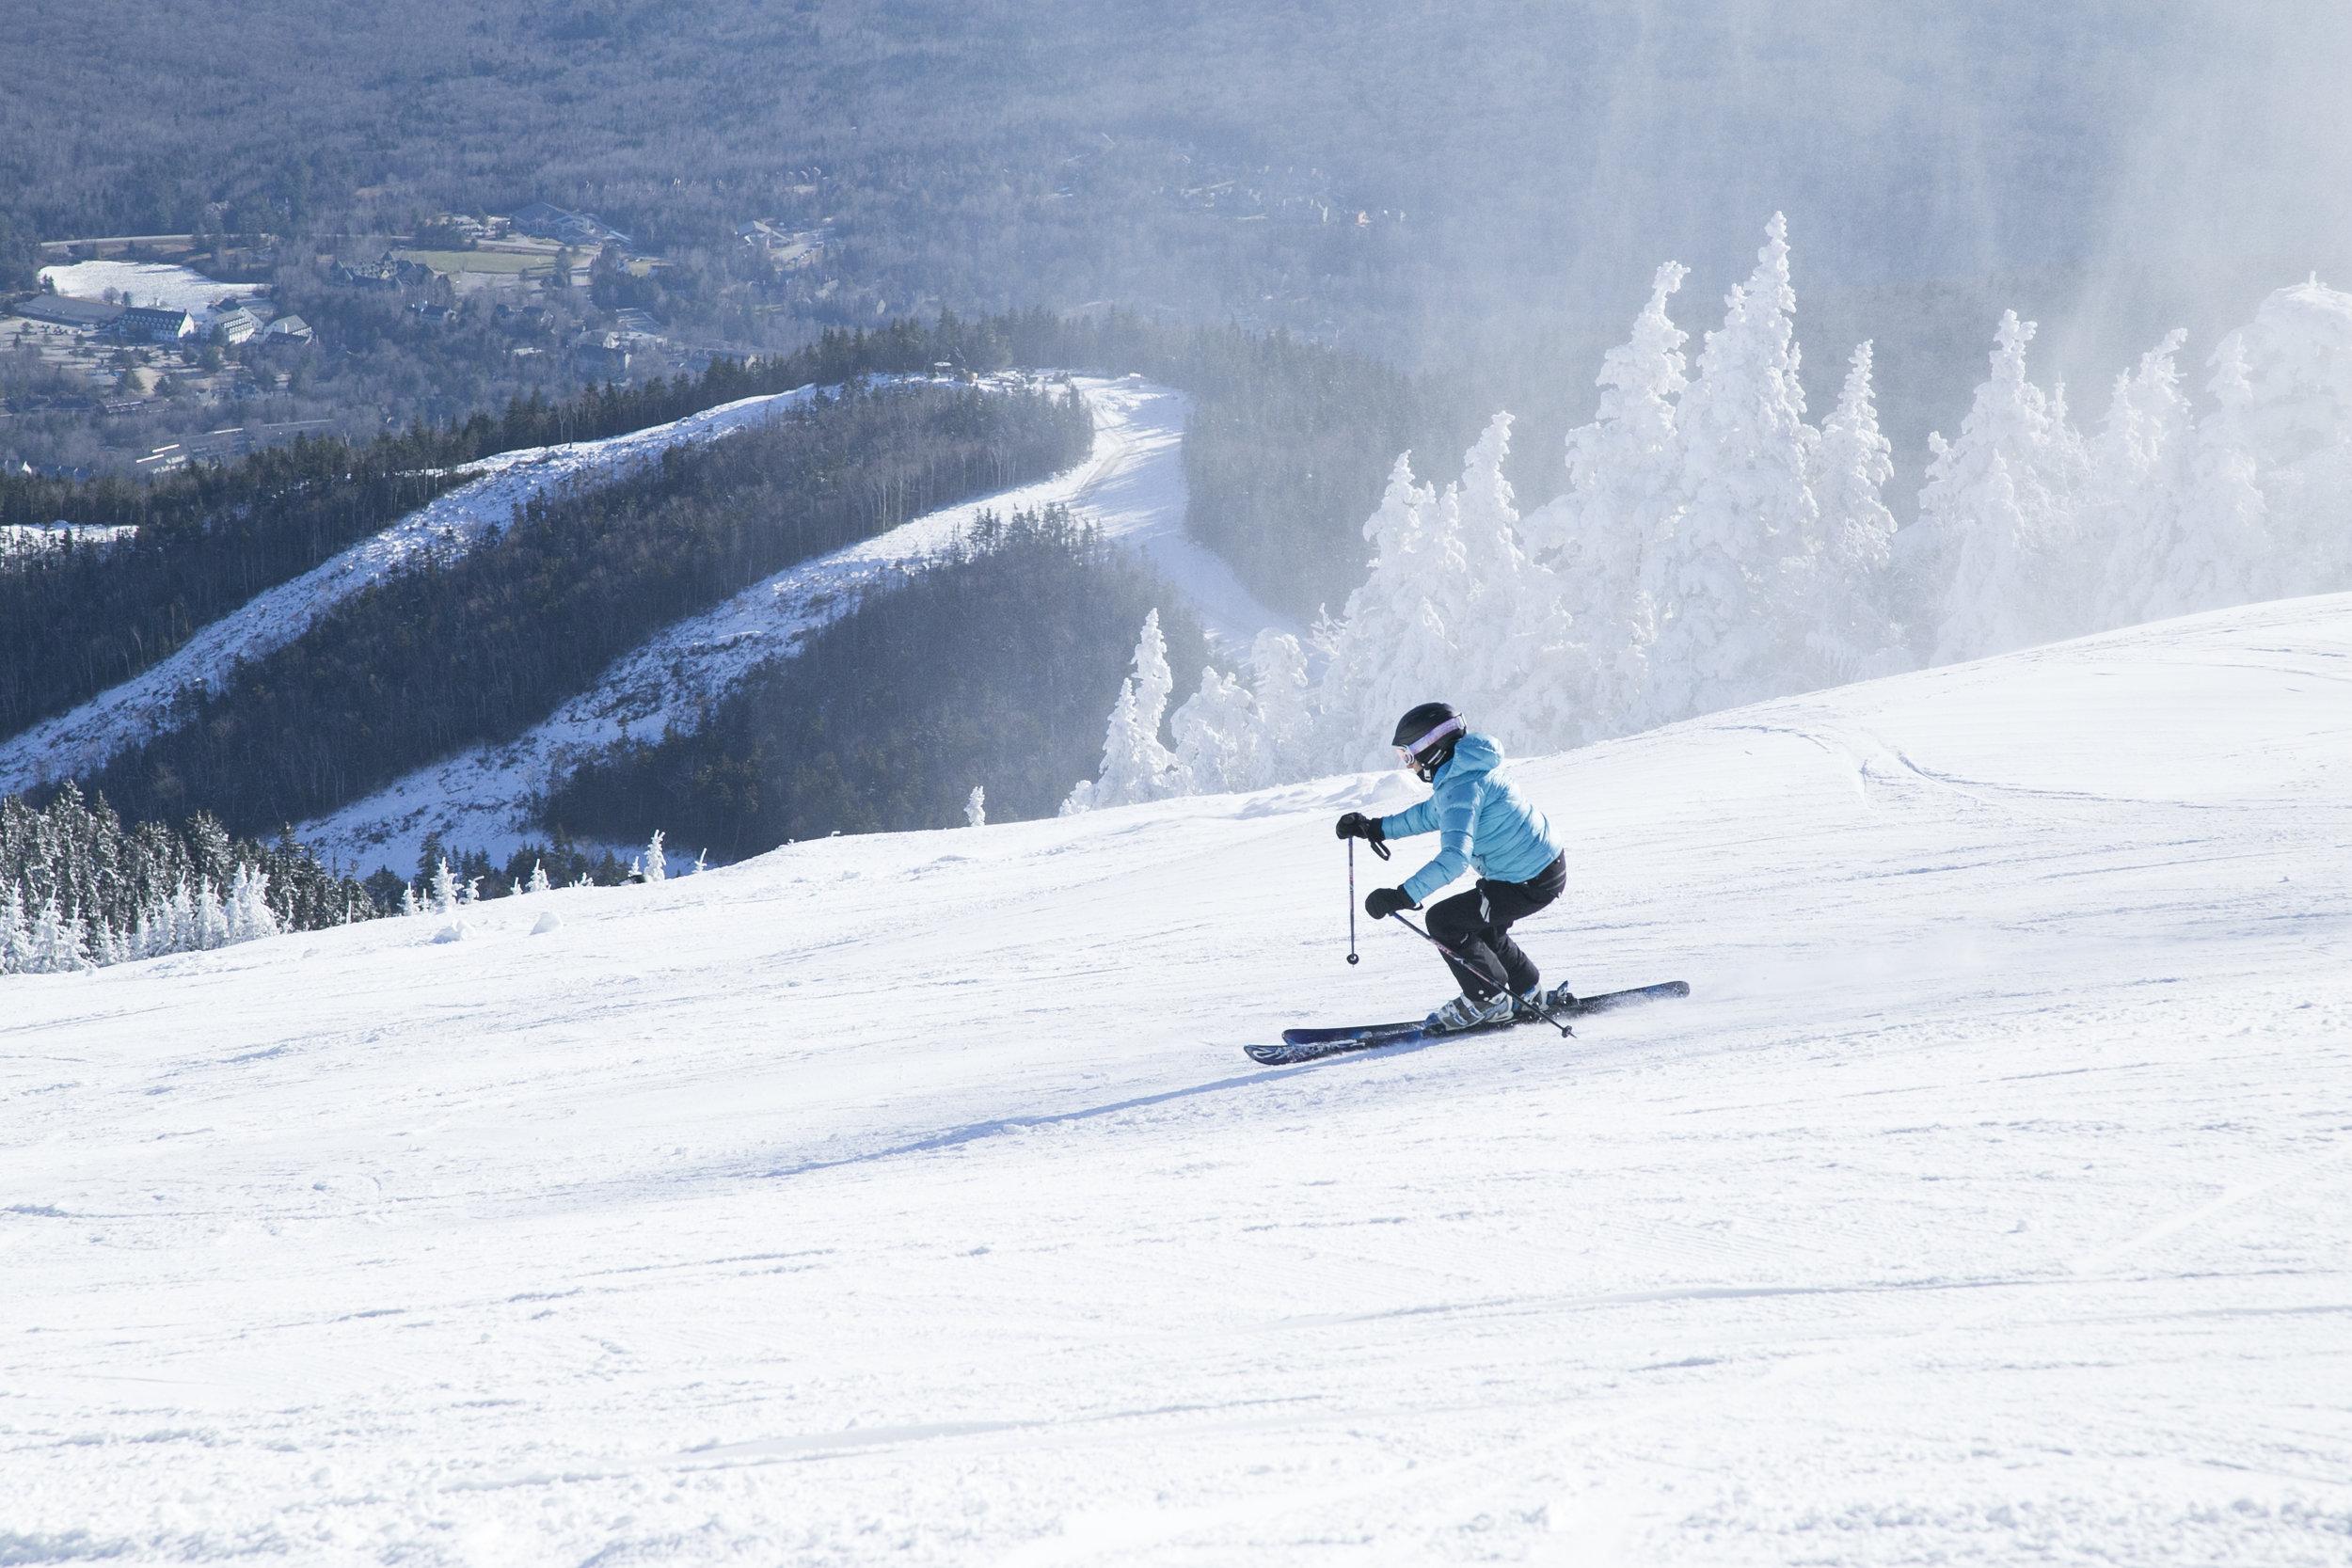 Green Peak with snow